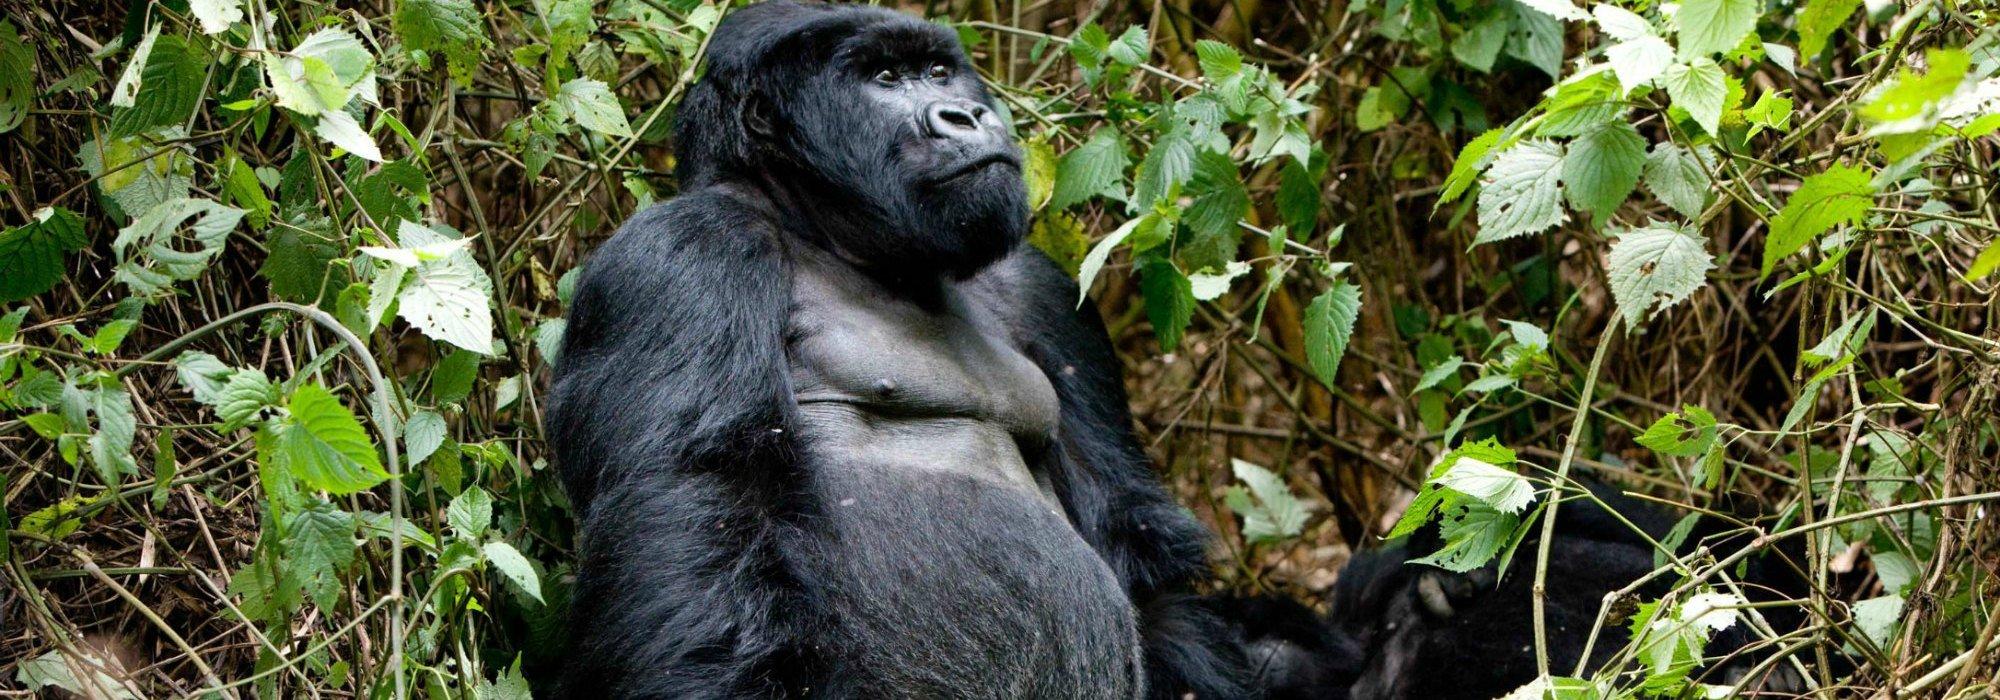 Volcanoes National Park Gorillas